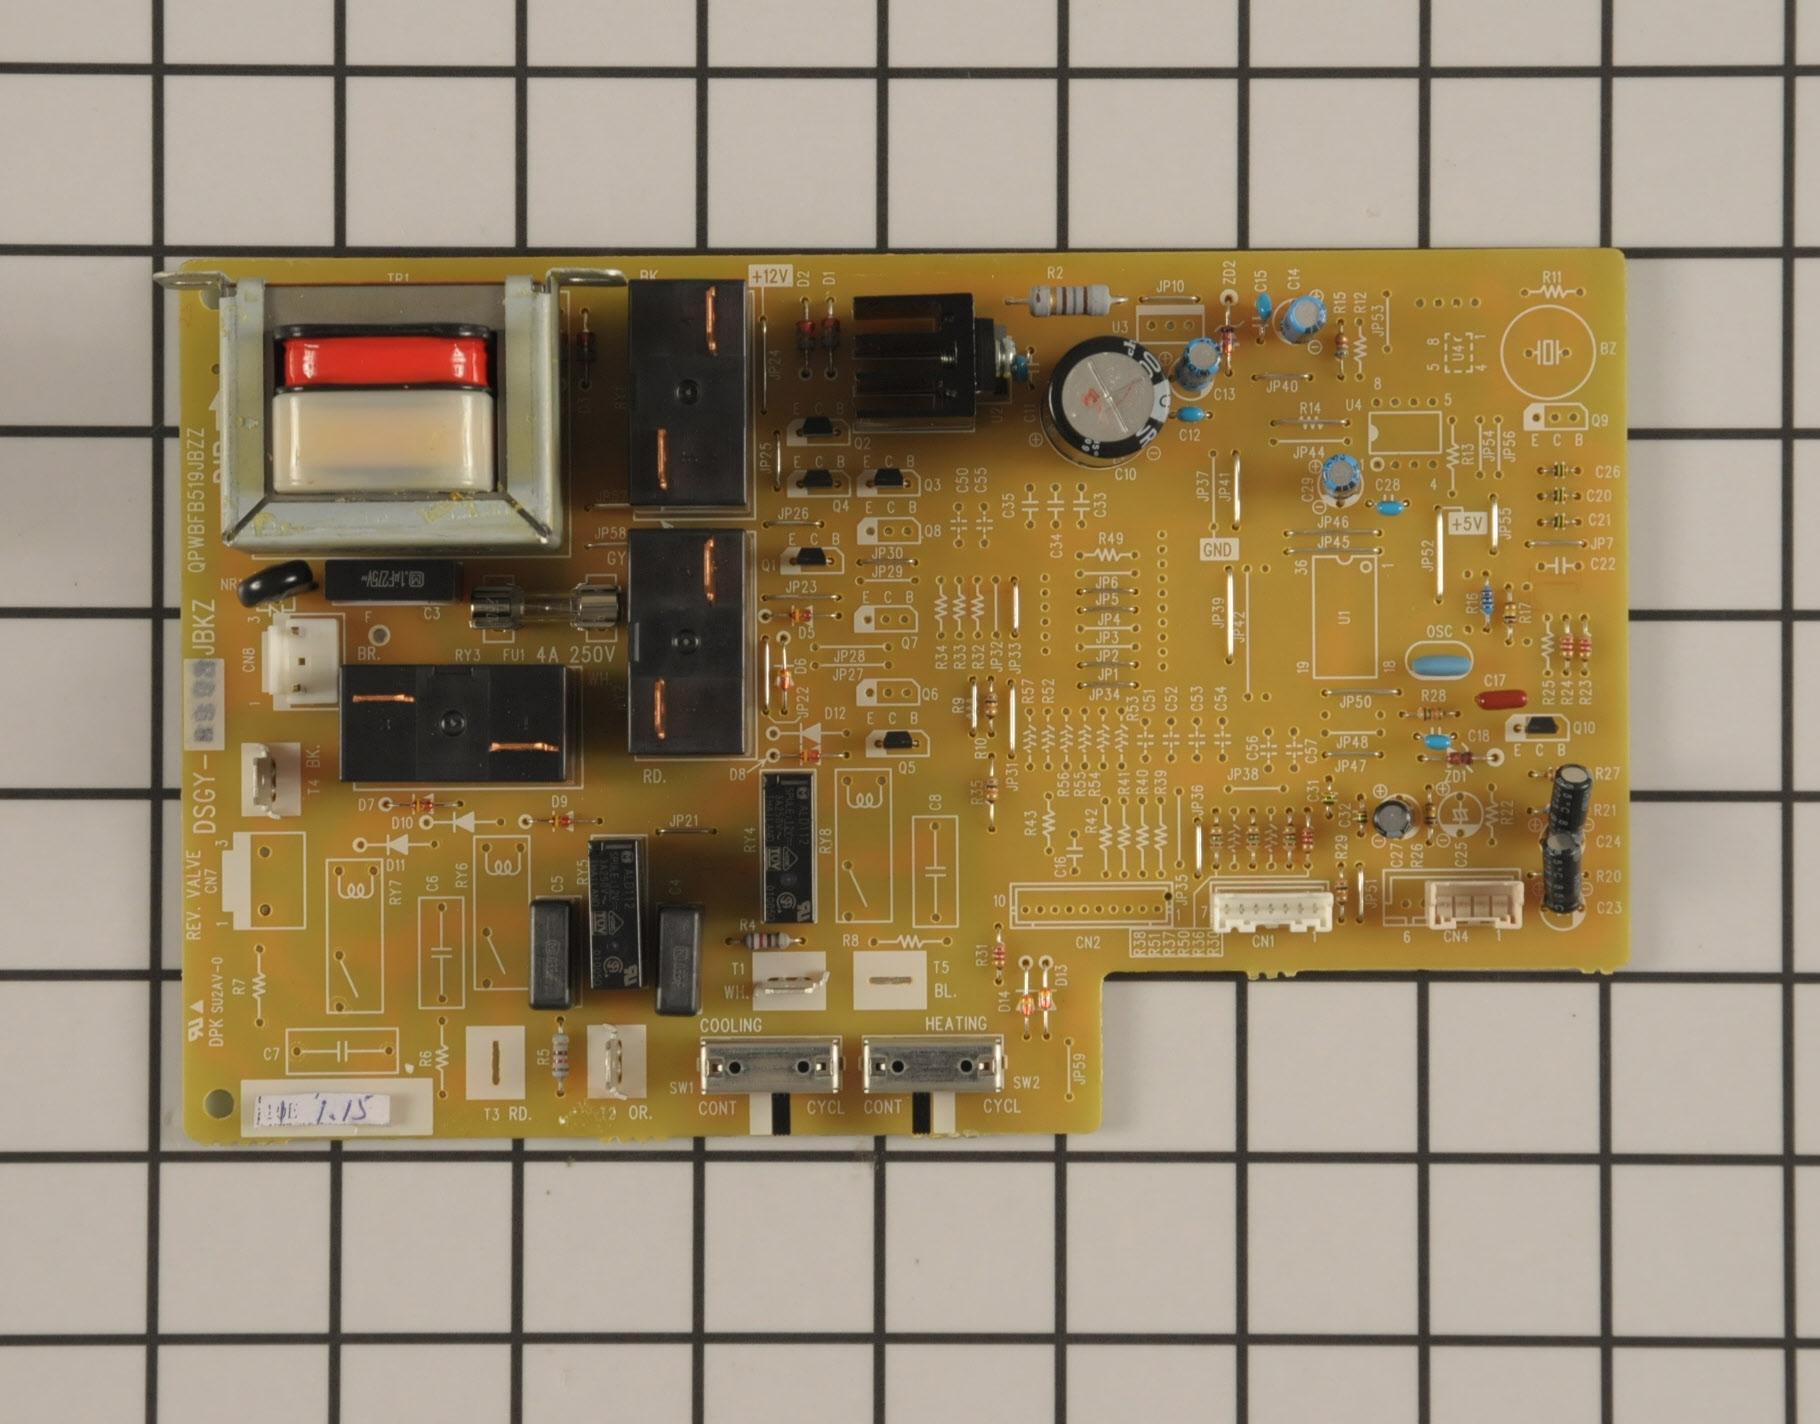 GE Air Conditioner Part # WJ28X10049 - Main Control Board